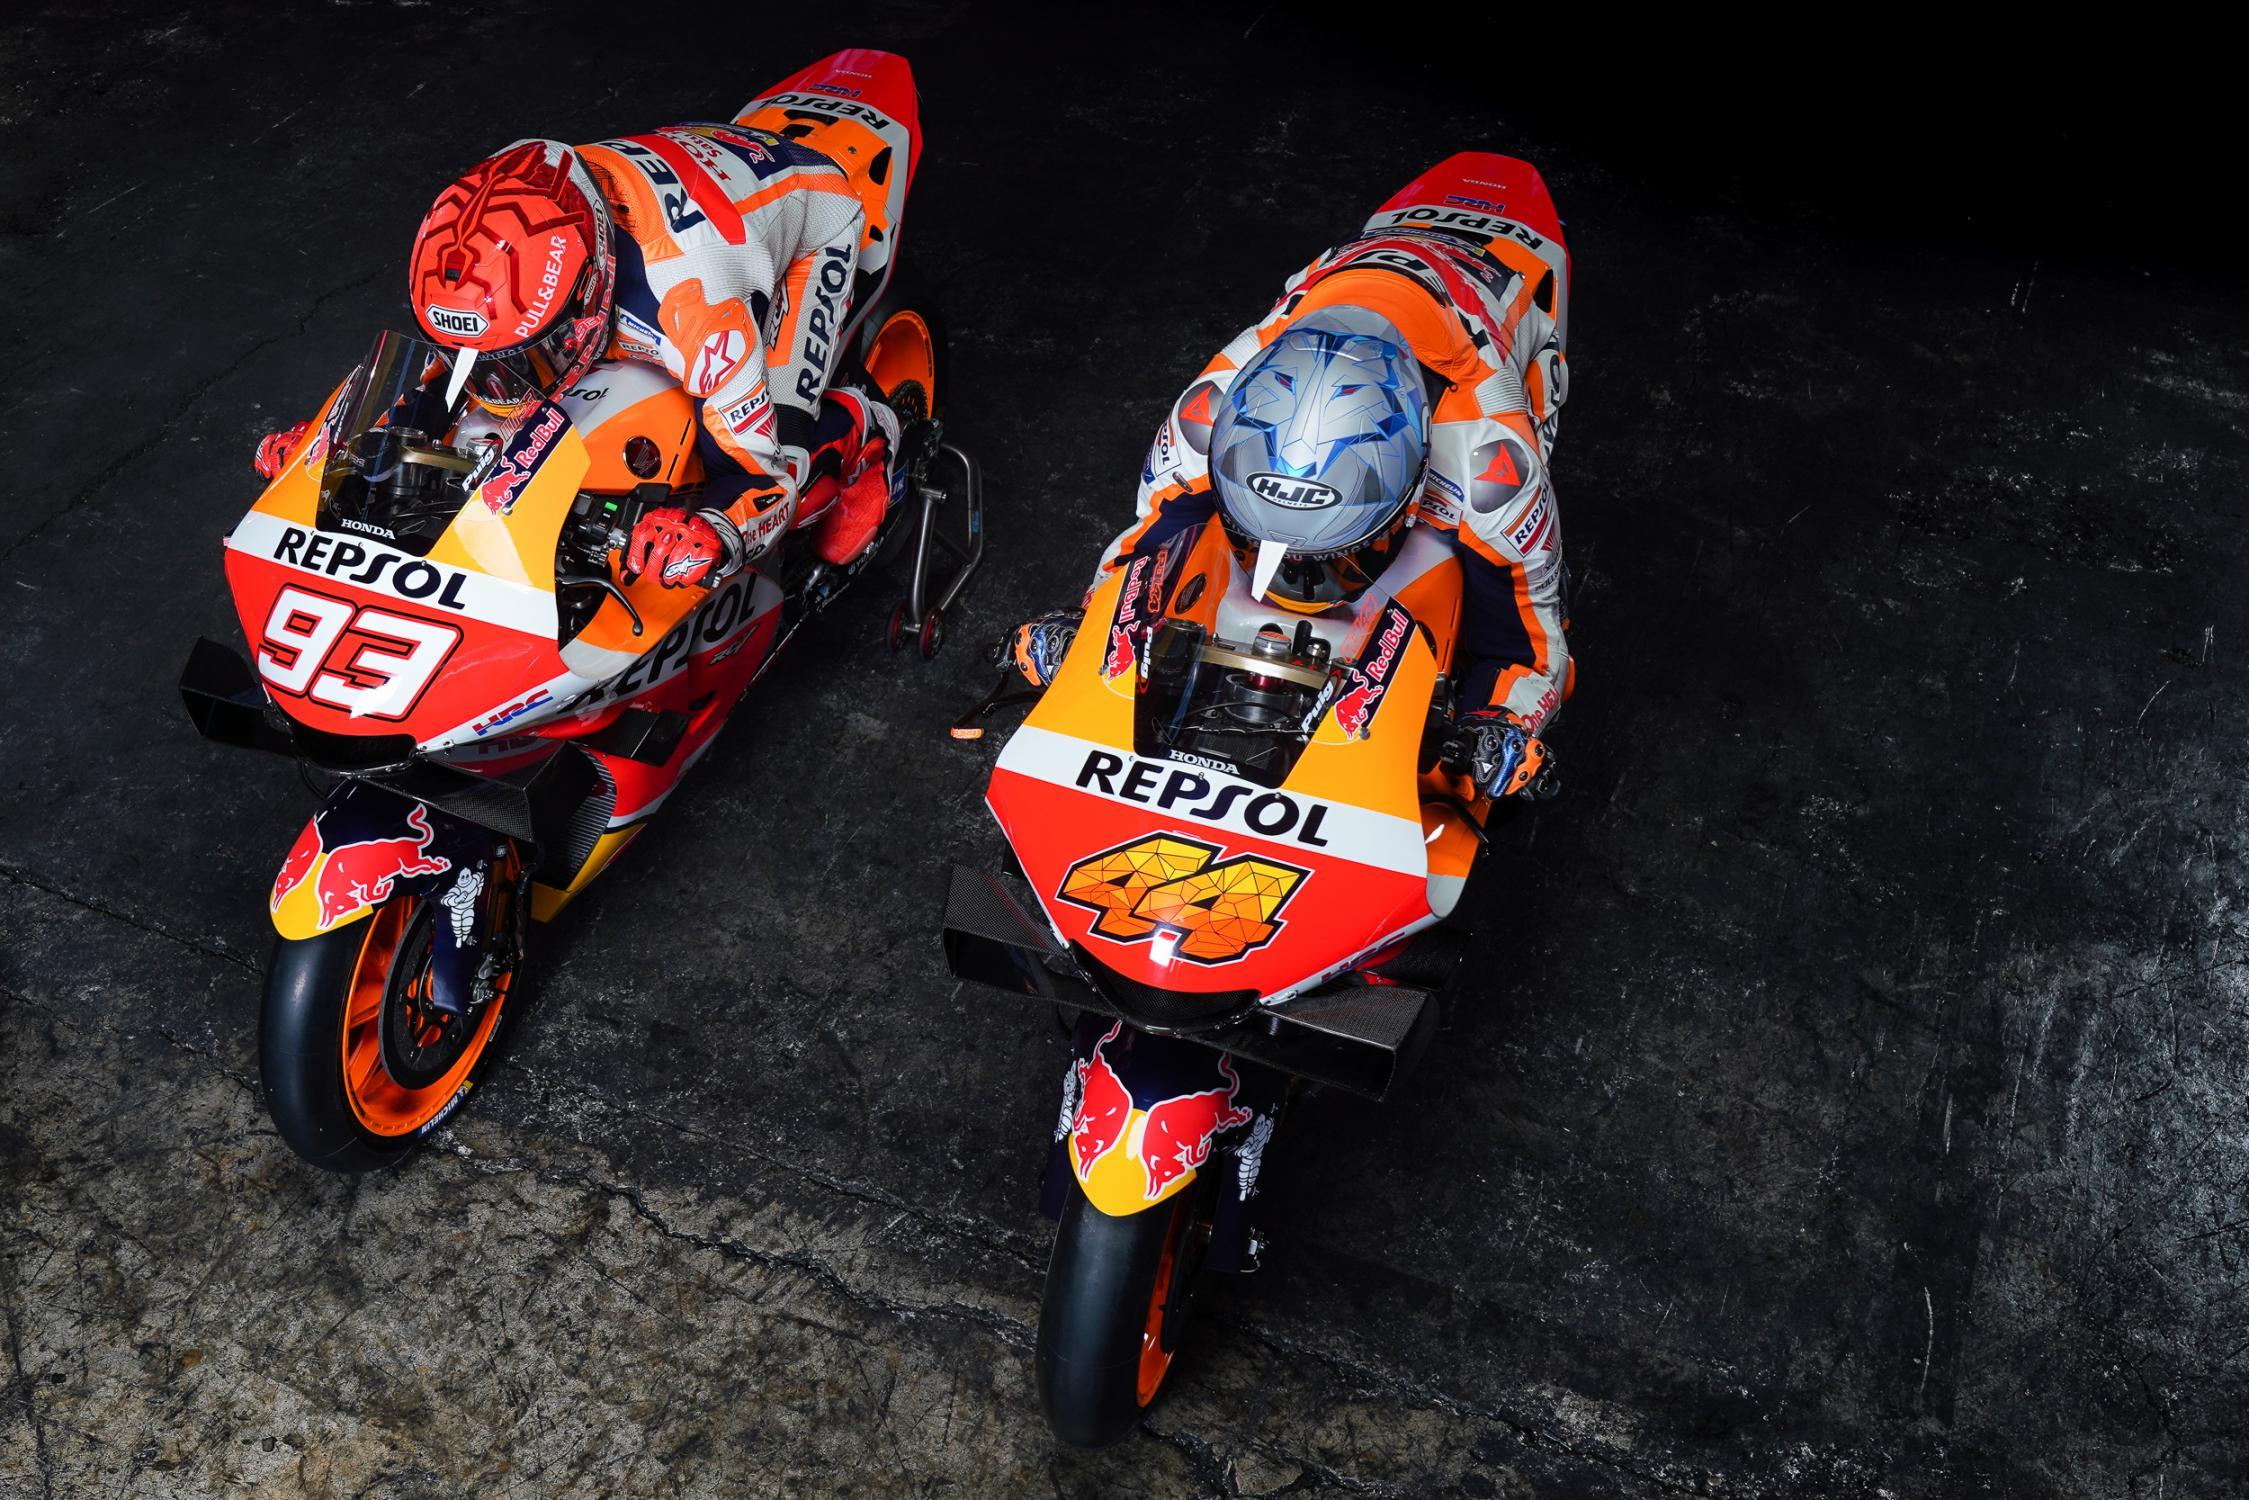 Marc Márquez, Pol Espargaró, Repsol Honda, MotoGP, 2021